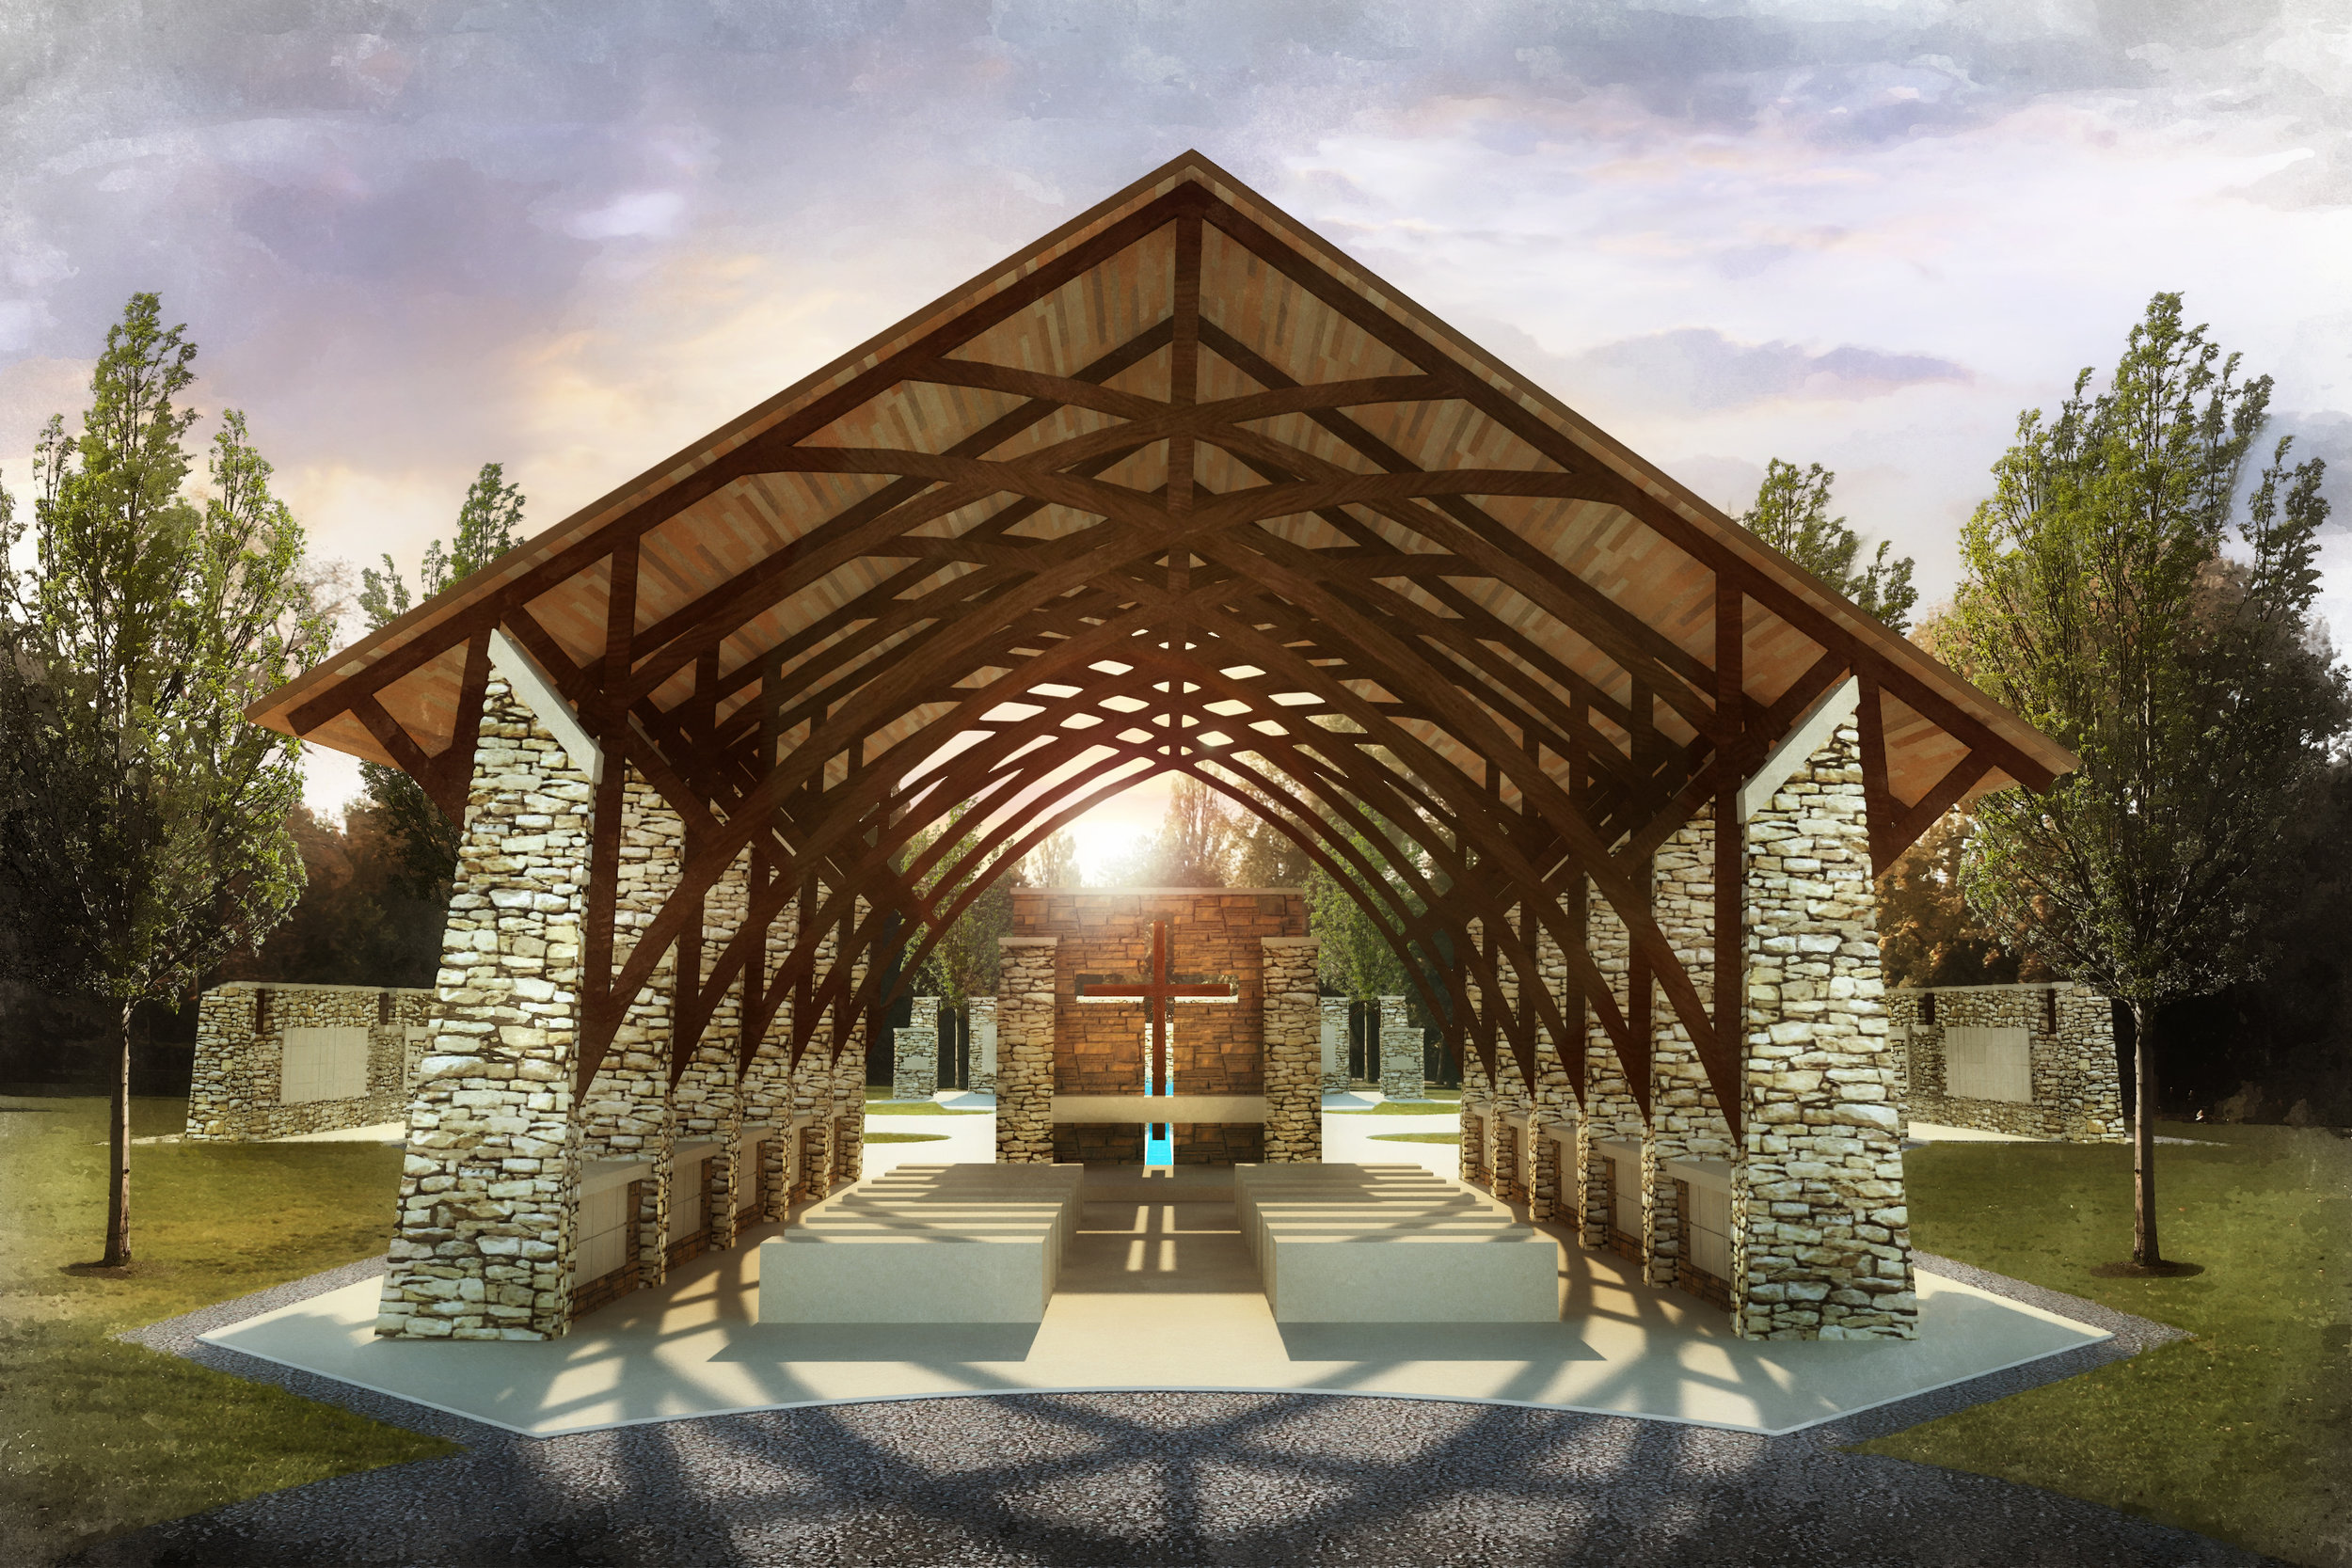 ADW-Faith-Based-St-Anne-Catholic-Church-Rock-Hill-SC-Exterior.jpg